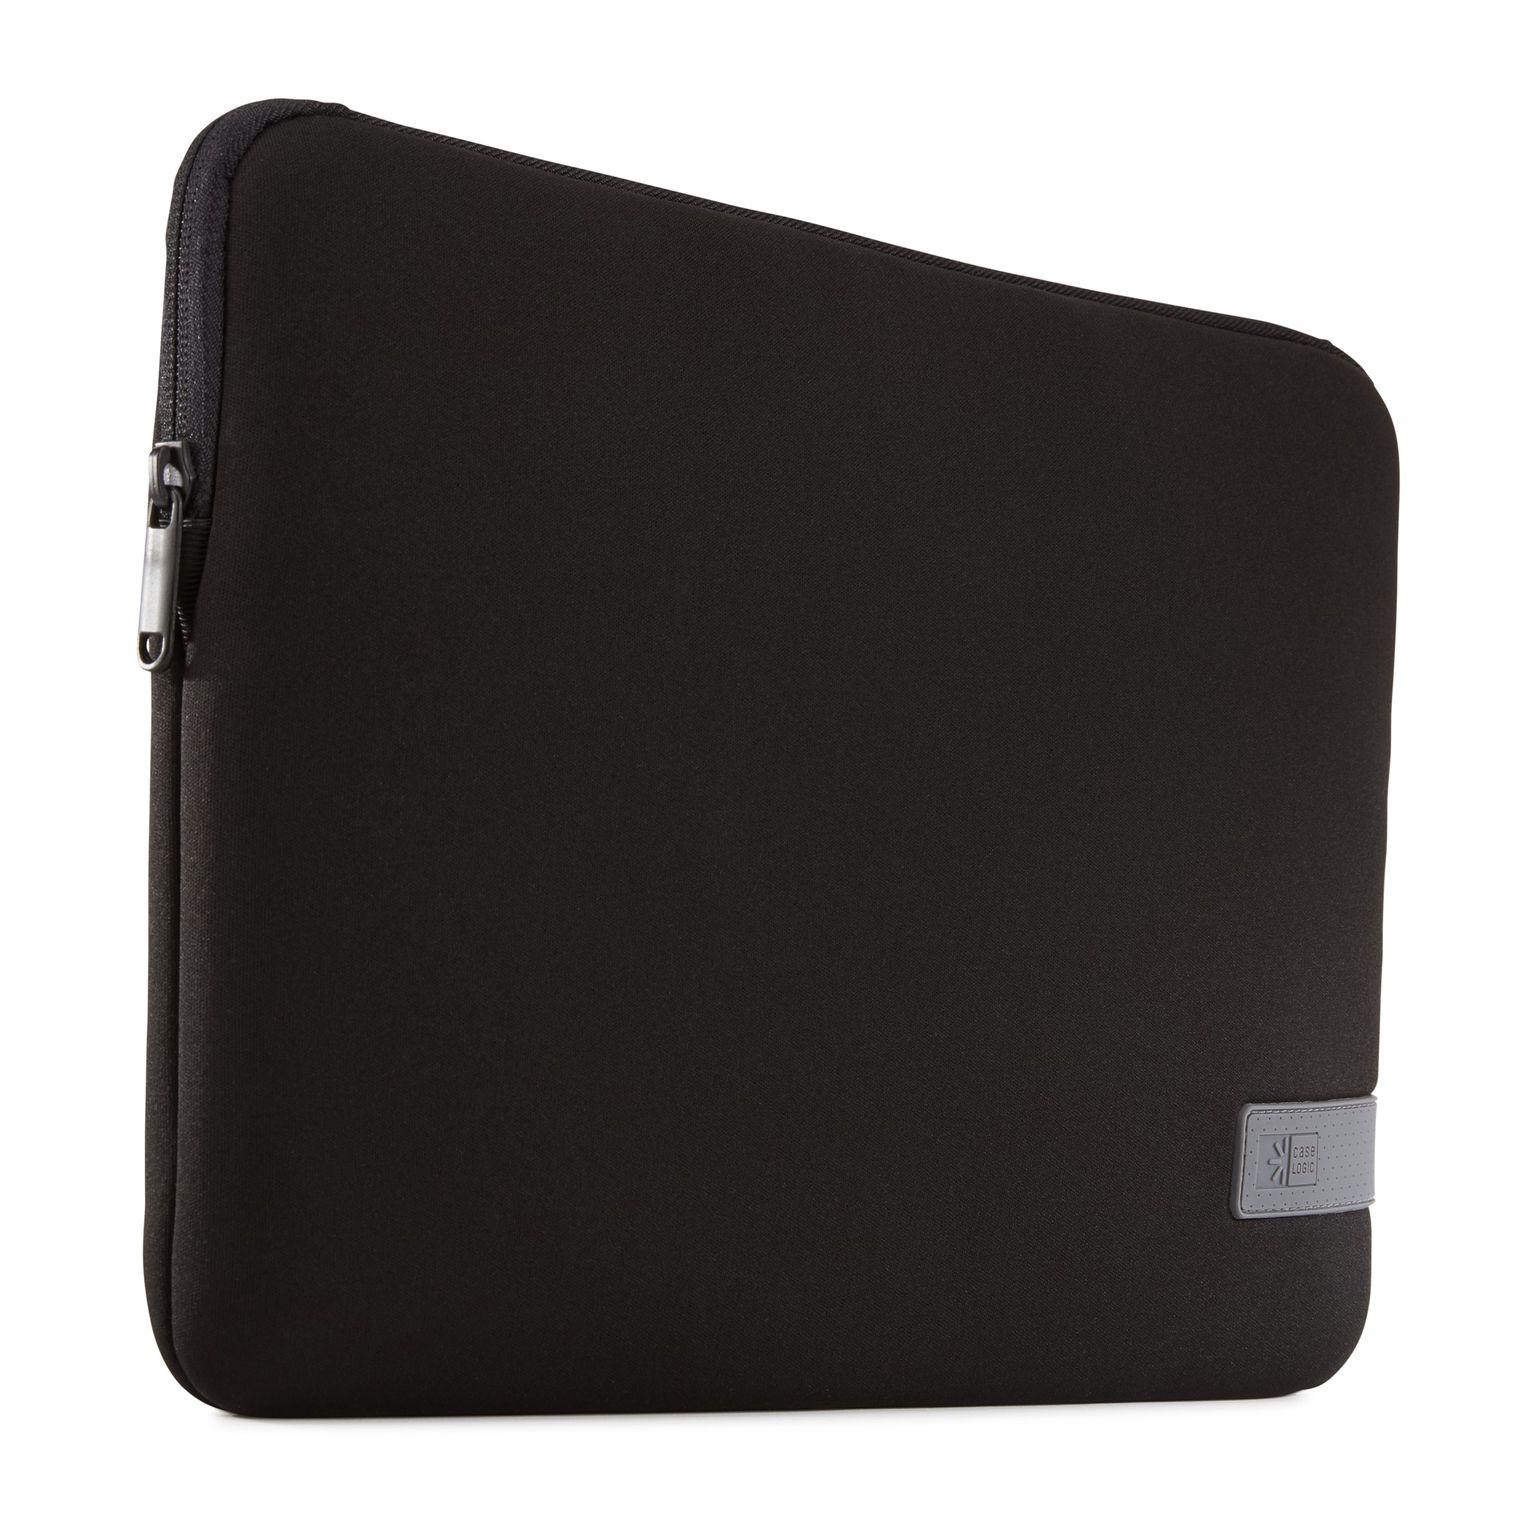 "Case Logic Reflect Laptop Sleeve 13"" No personalization Black"